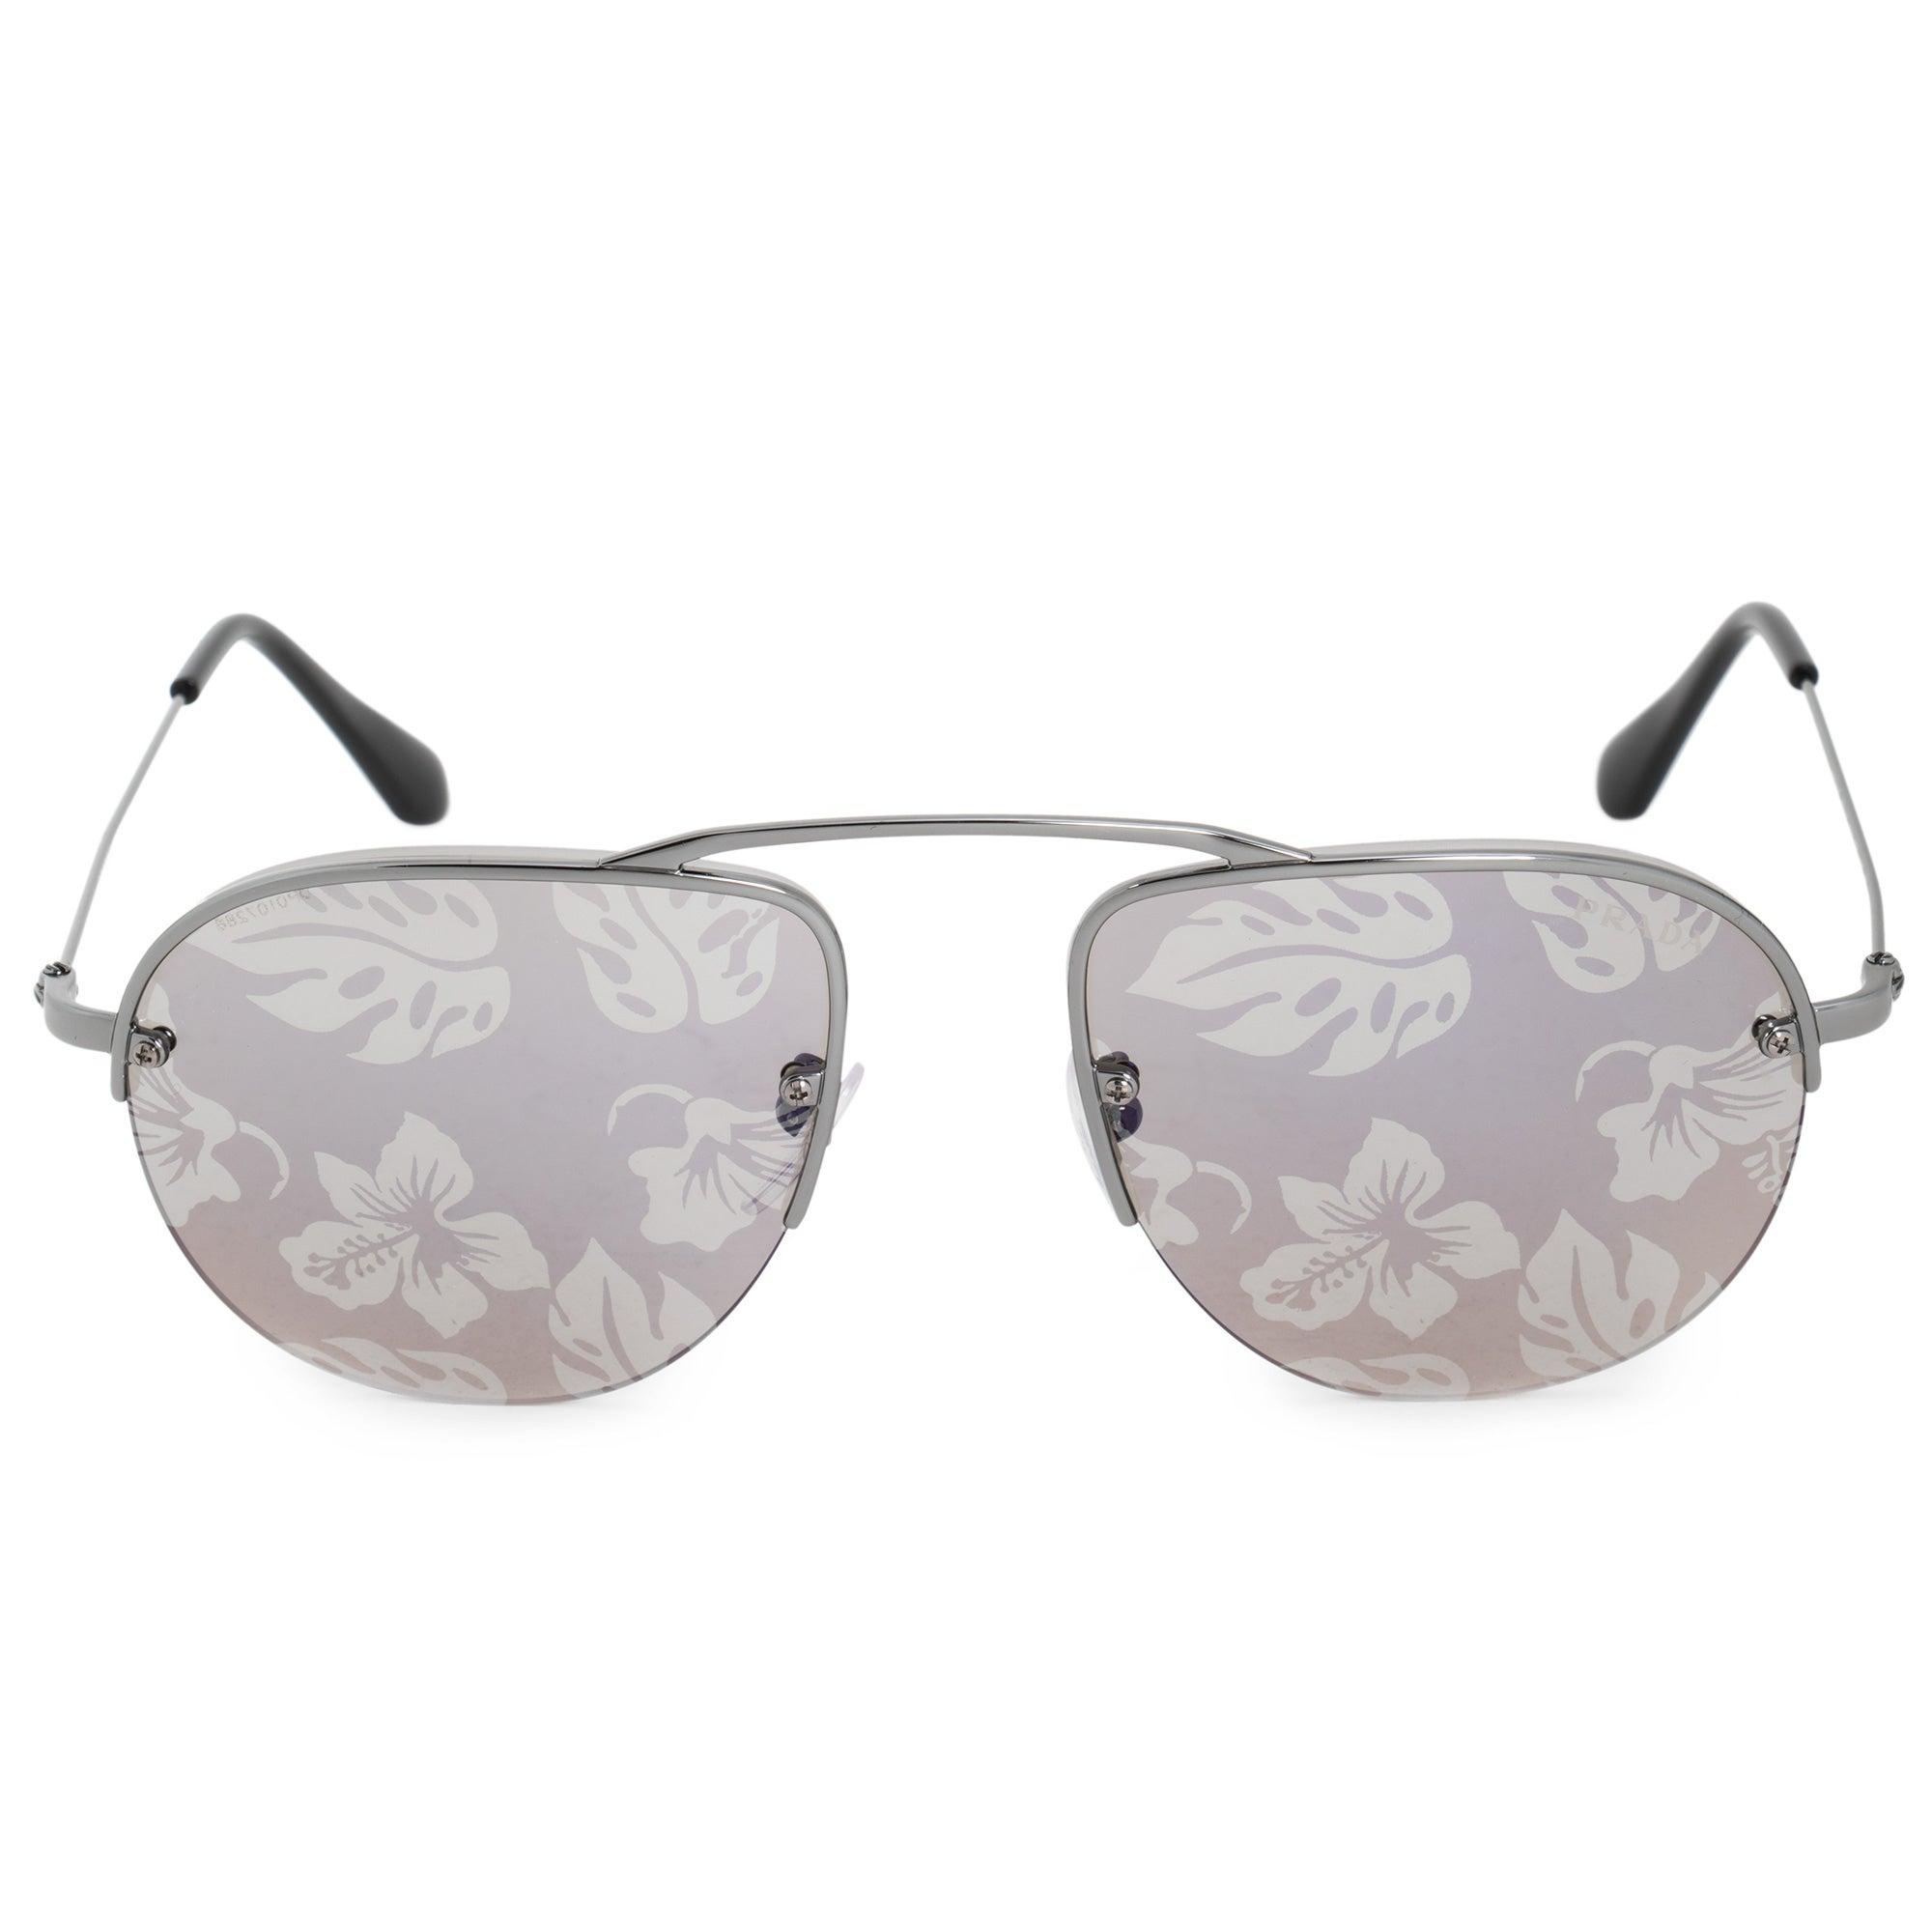 88ab980f711 Shop Prada Teddy Pilot Sunglasses PR58OS 5AV6R0 55 - Free Shipping ...